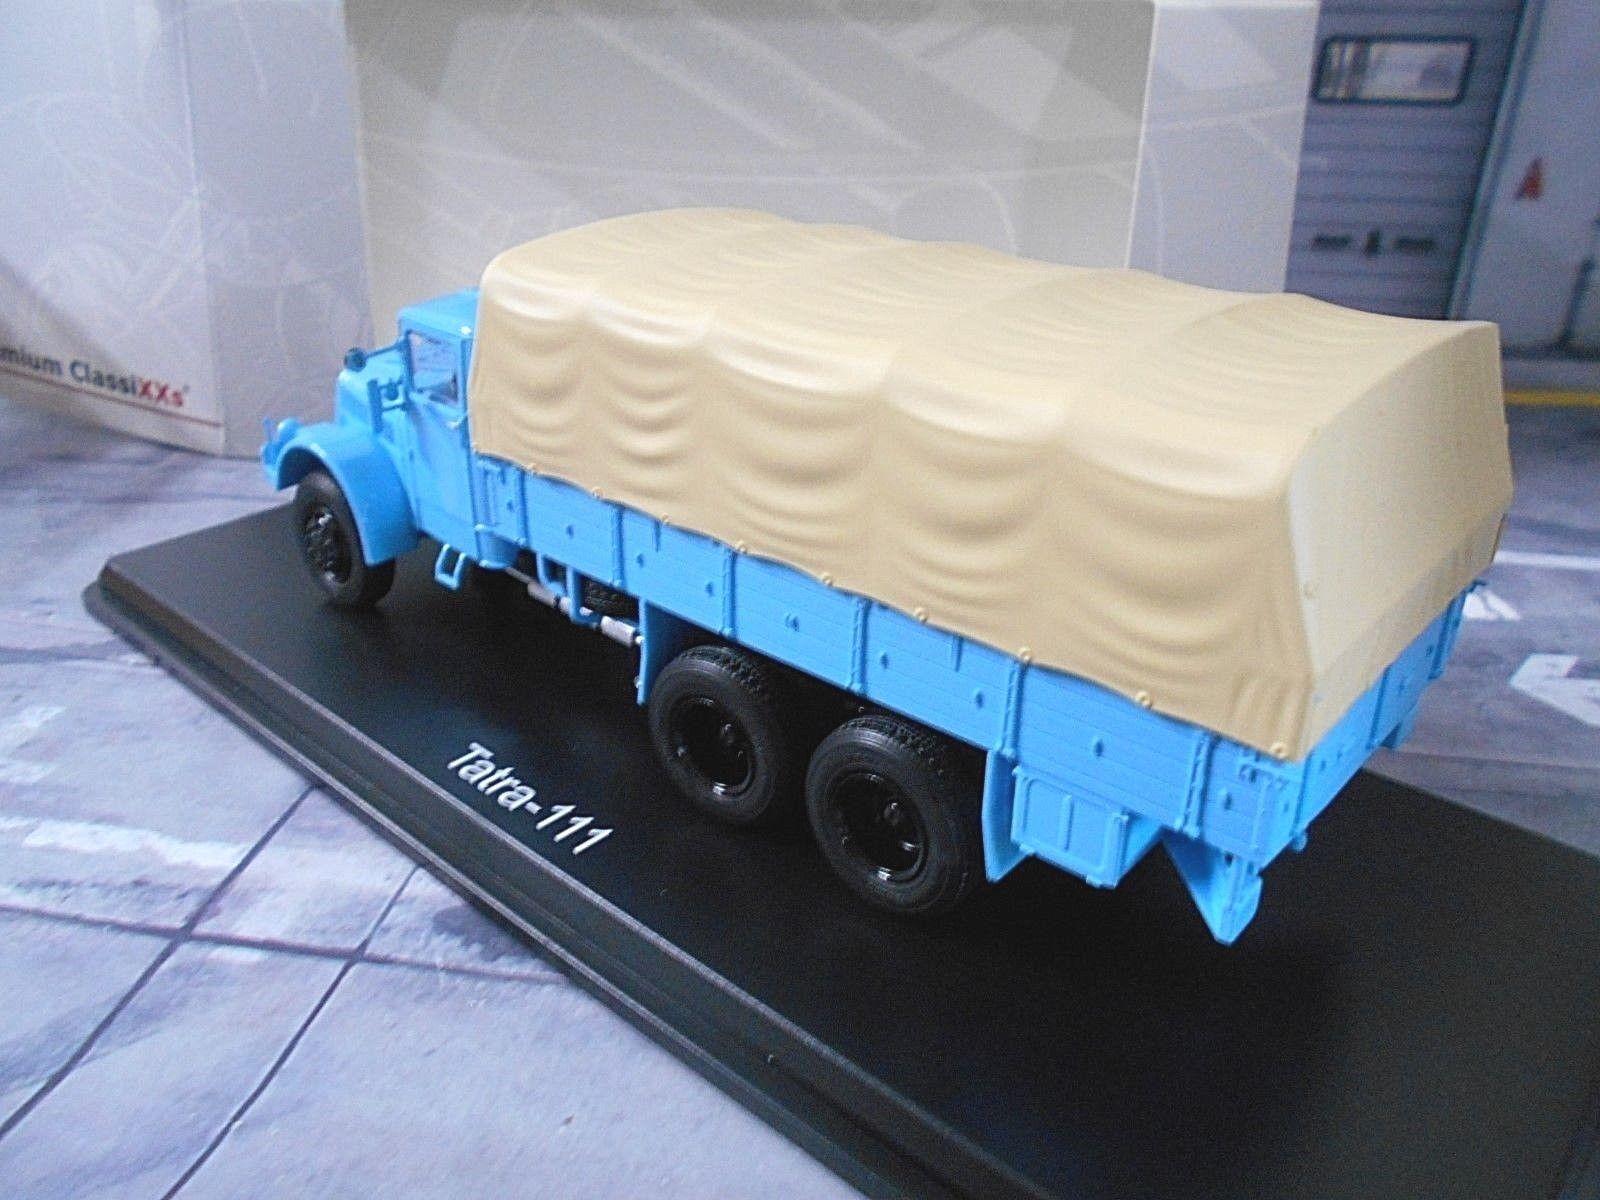 Tatra 111 PICK-UP Bâche BLEU BLEU BLEU BLUE TRUCK CAMION ostblockpcl PREMIUM CLASSIXXS 1:43   La Qualité  eaf333